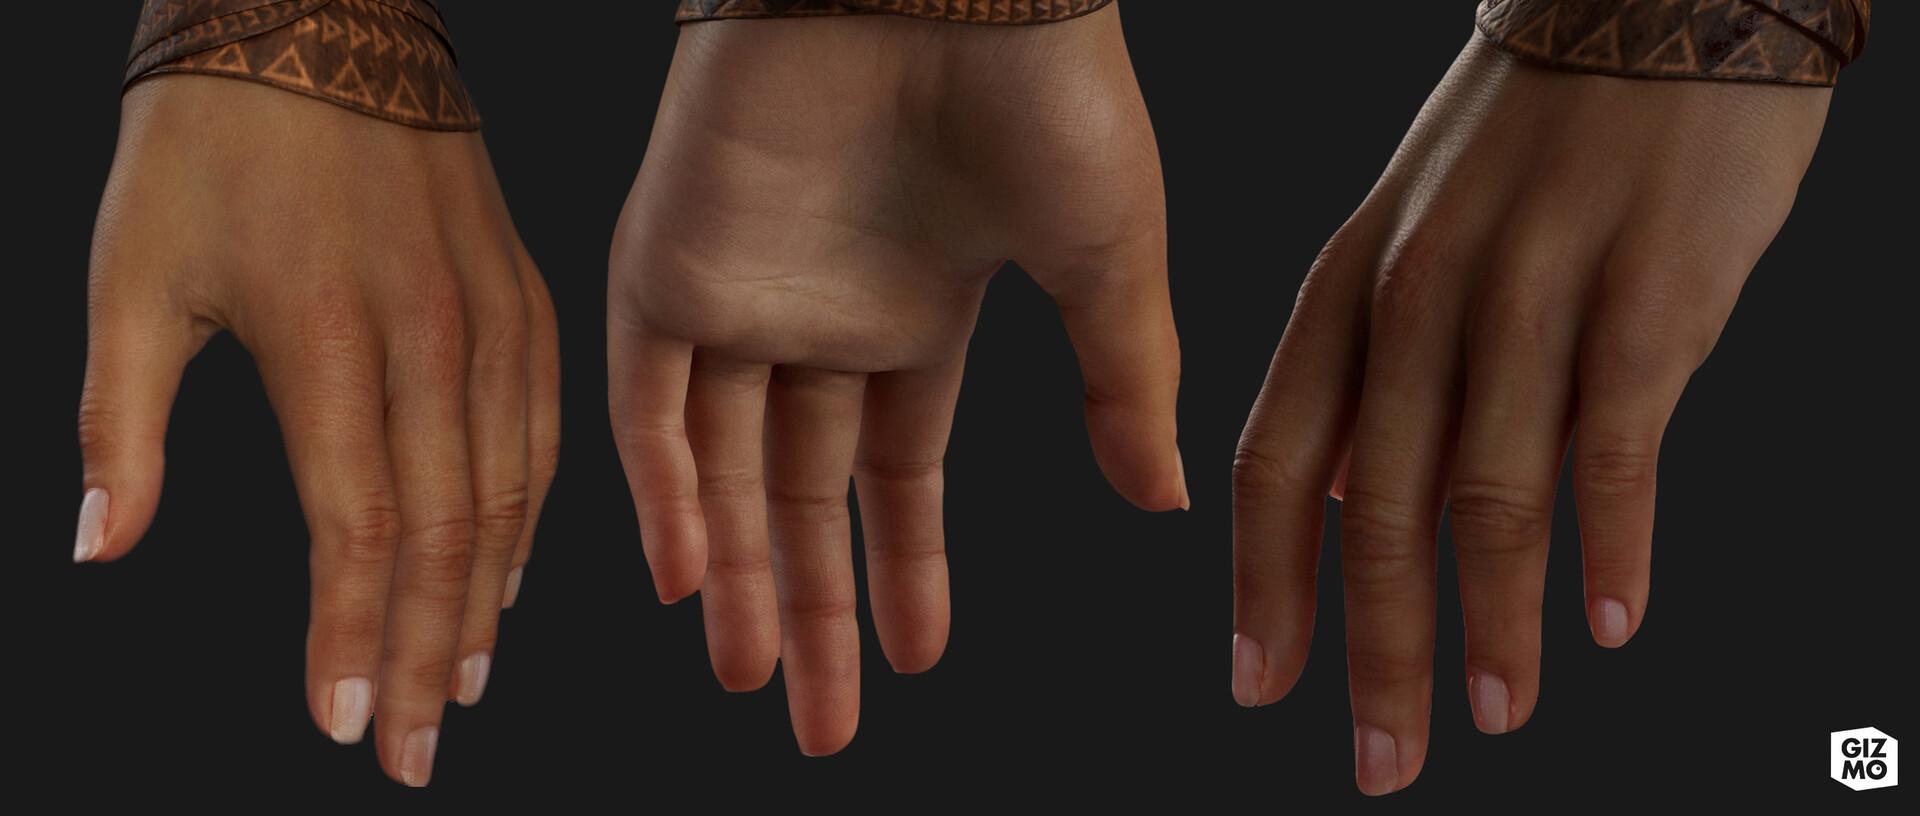 Vinicius favero hands